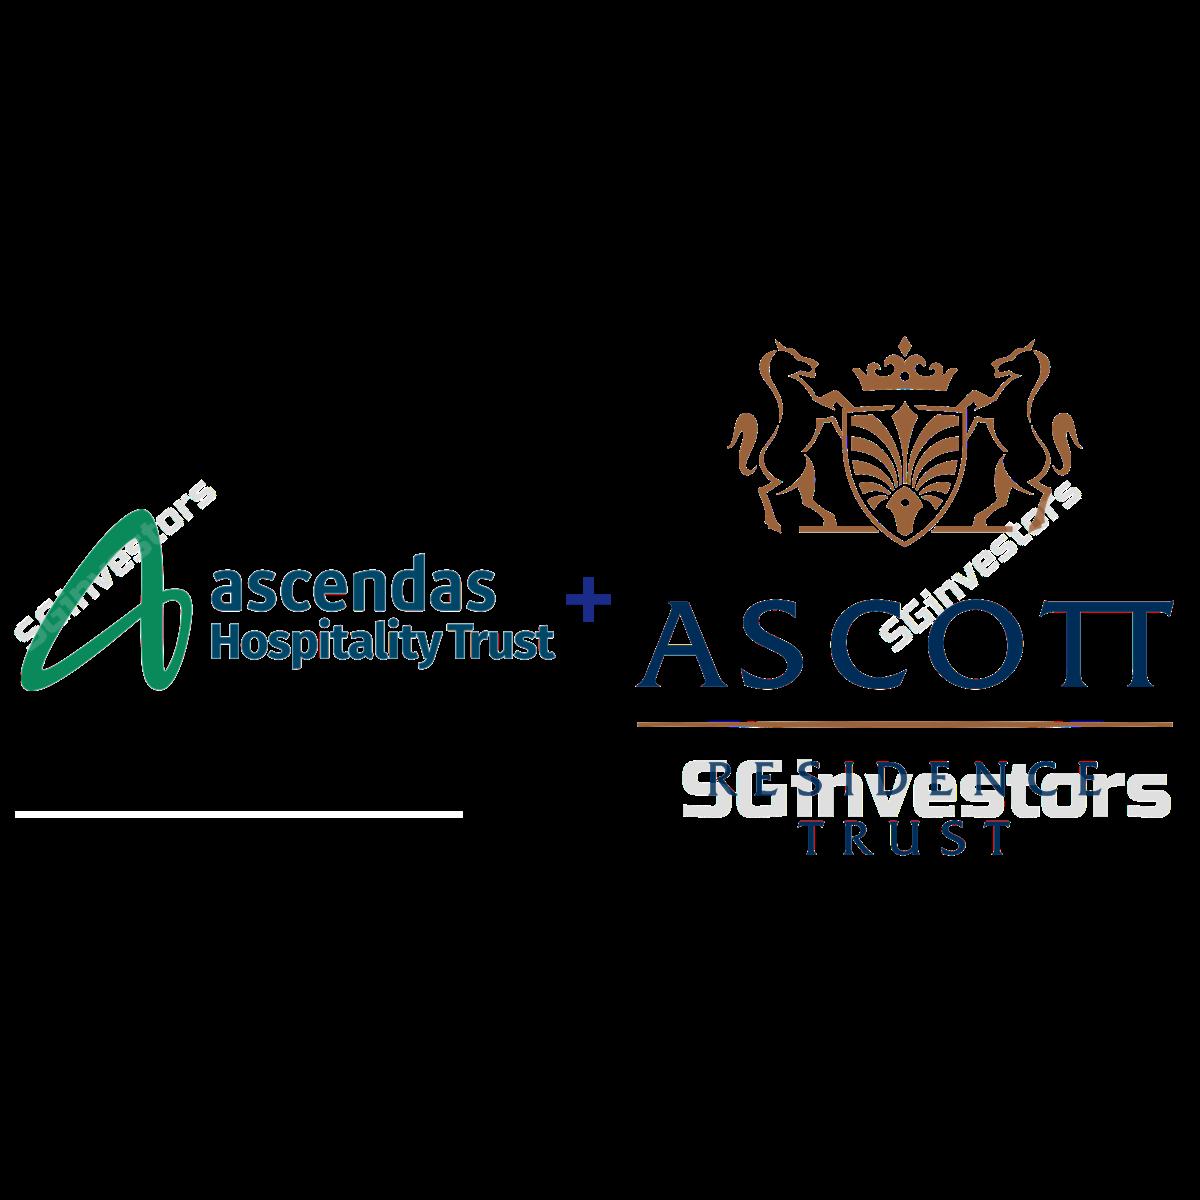 ASCOTT RESIDENCE TRUST (SGX:A68U) | SGinvestors.io